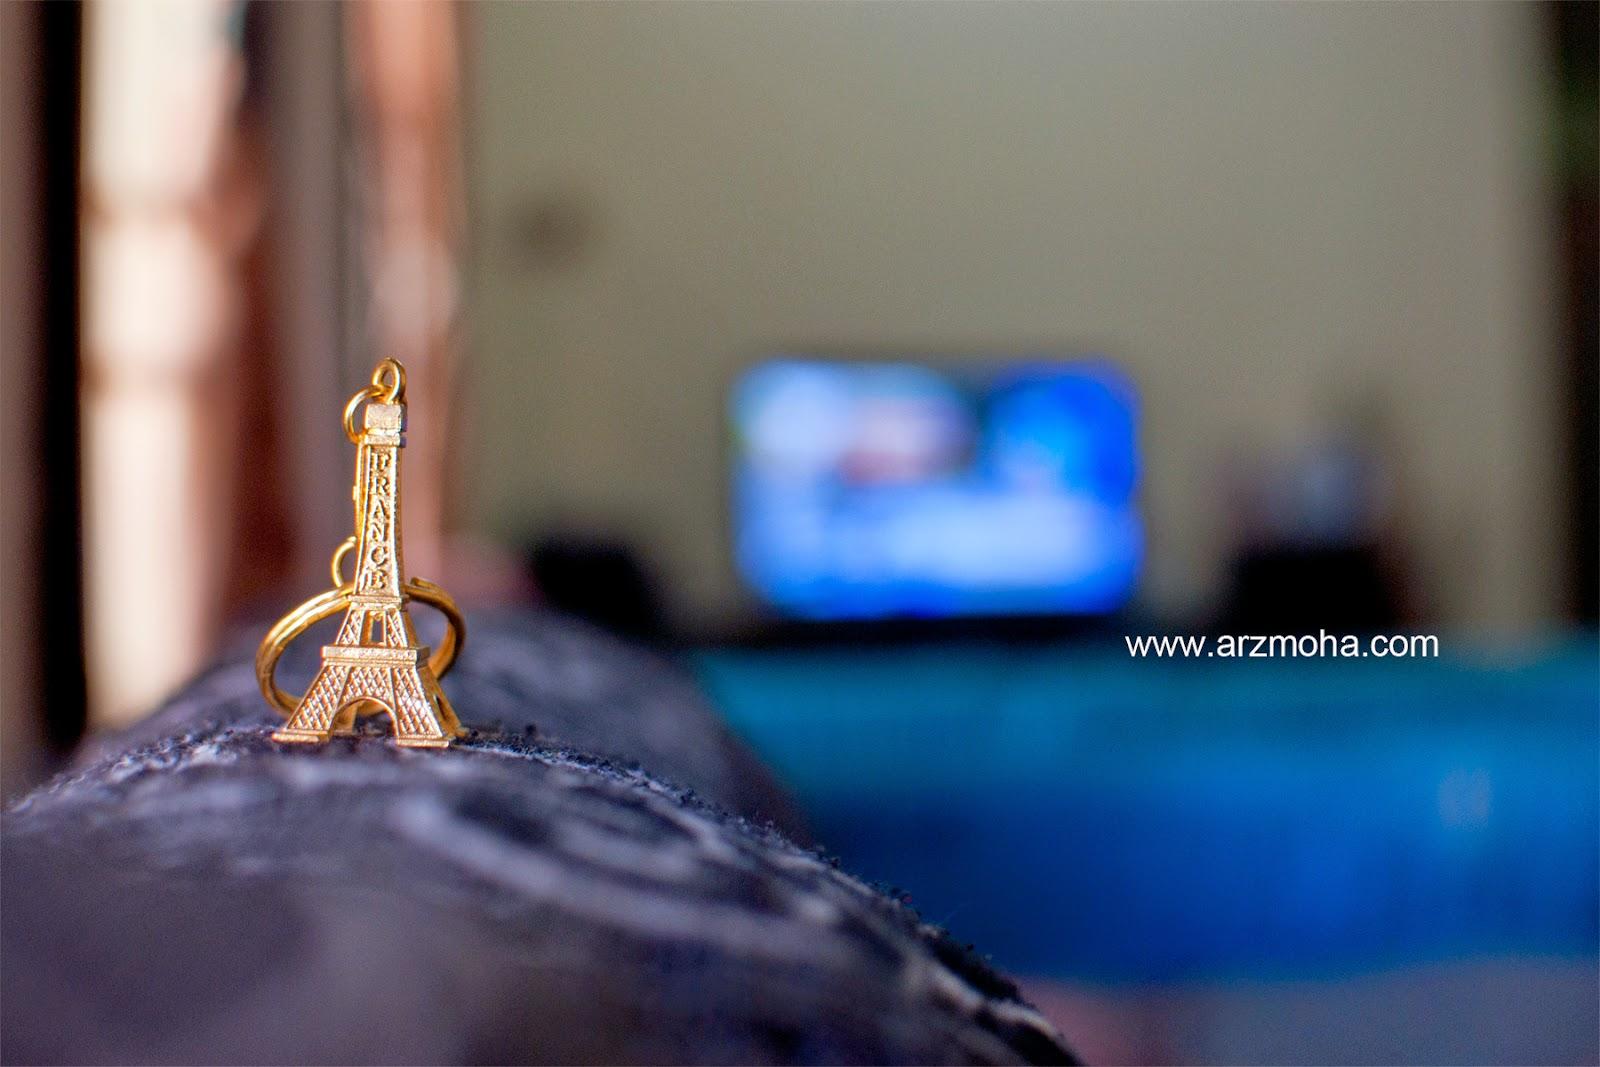 Eiffel tower, paris, france, arzmoha